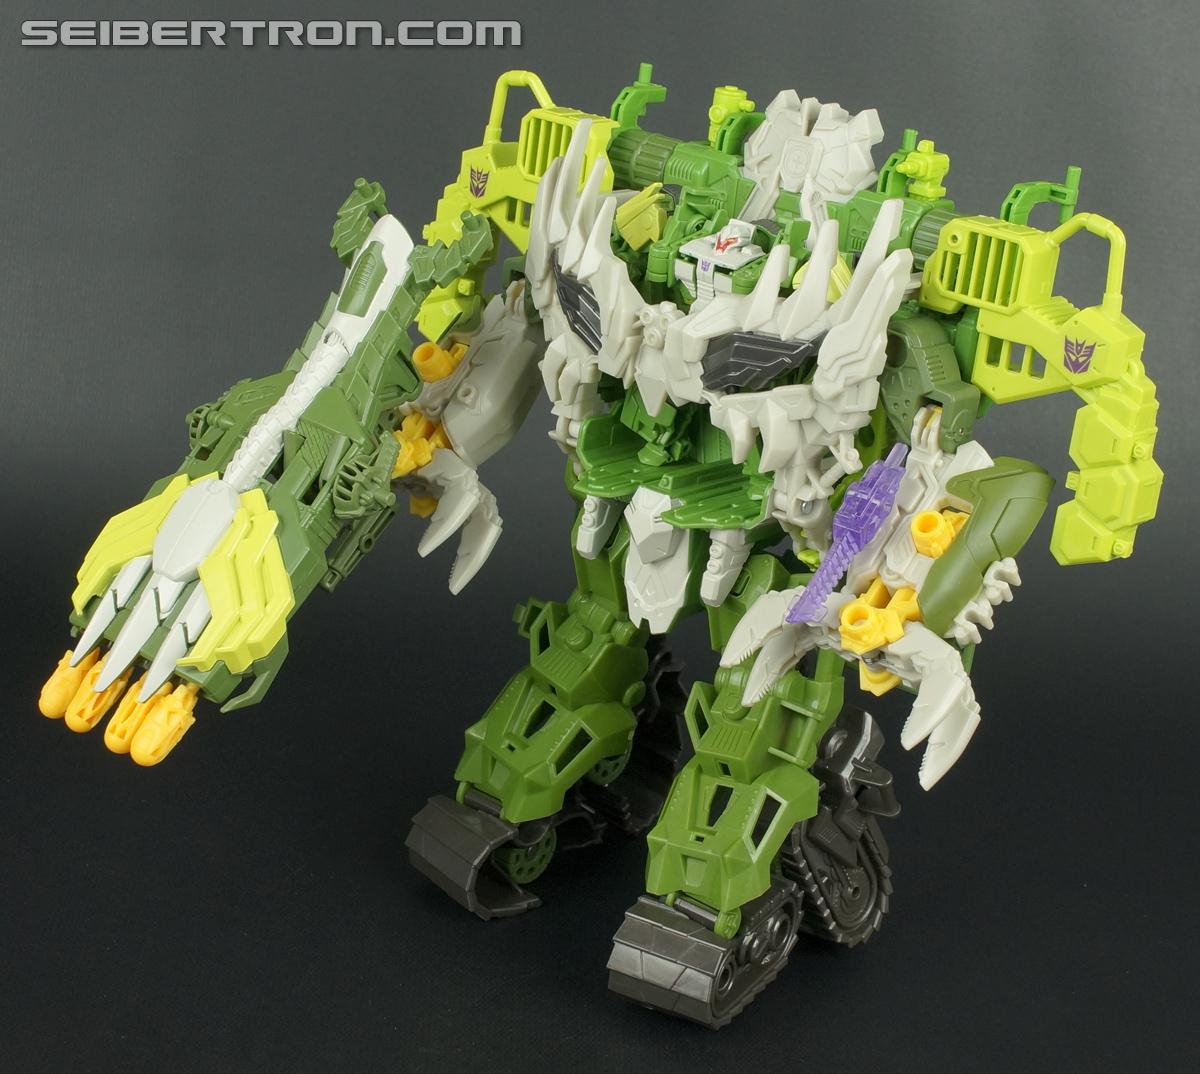 Transformers Prime Beast Hunters Cyberverse Apex Hunter Armor (Image #50 of 96)